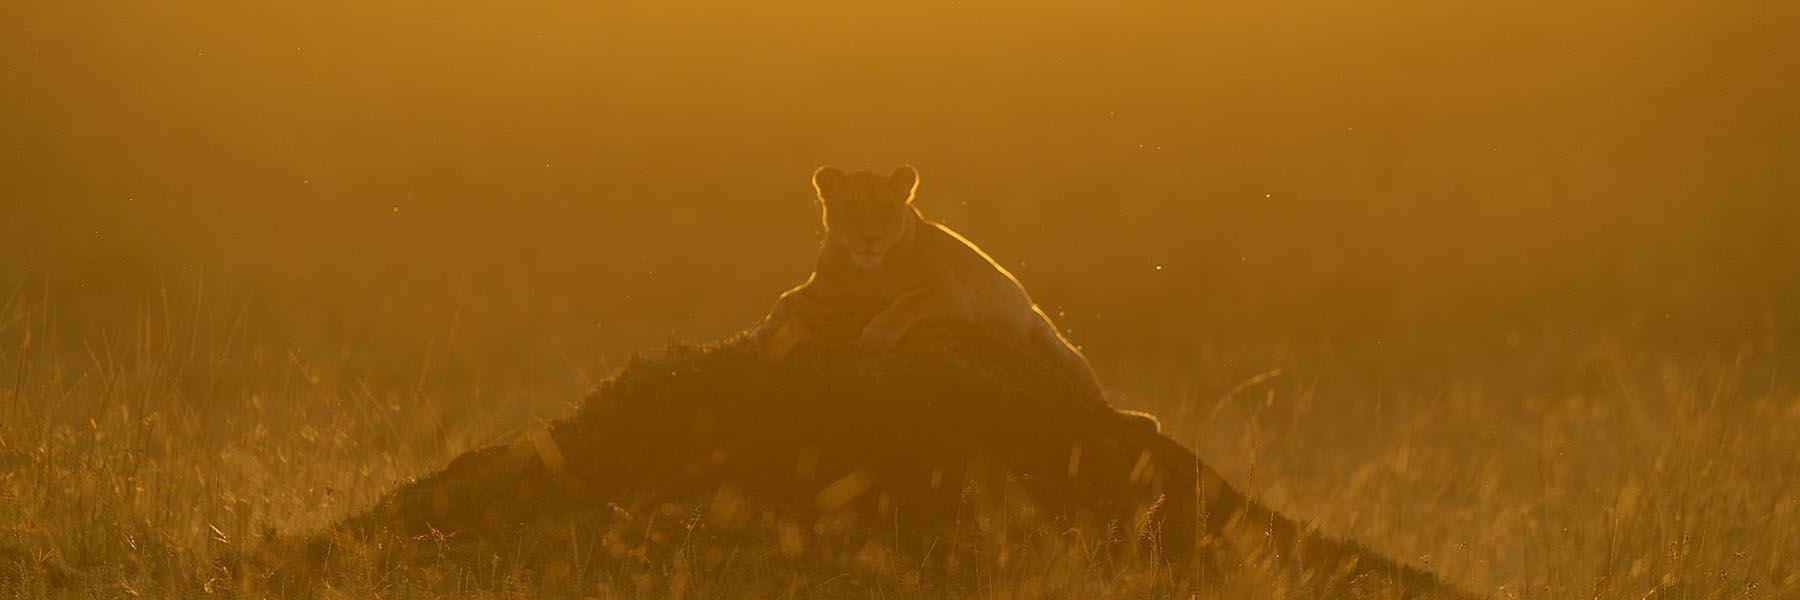 Masai Mara experience